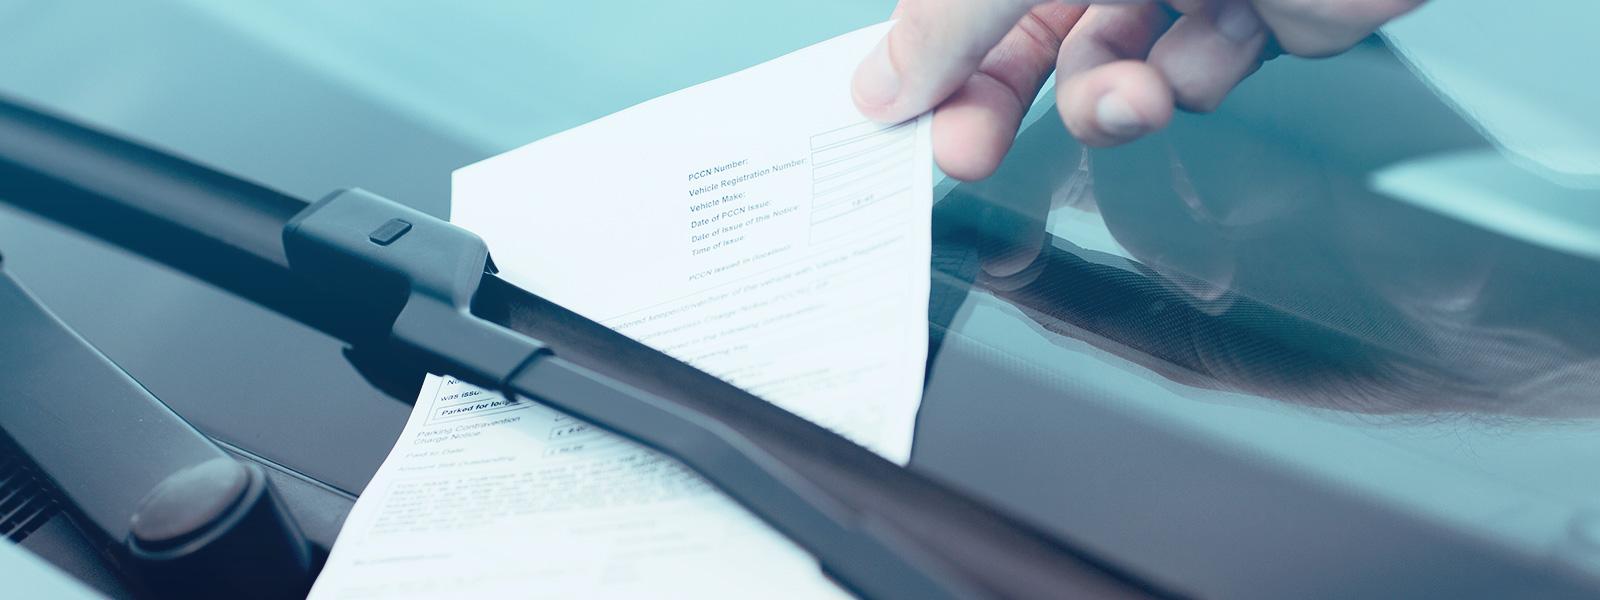 ceabs-blog-prefeitura-sao-paulo-abre-dados-multas-aplicadas